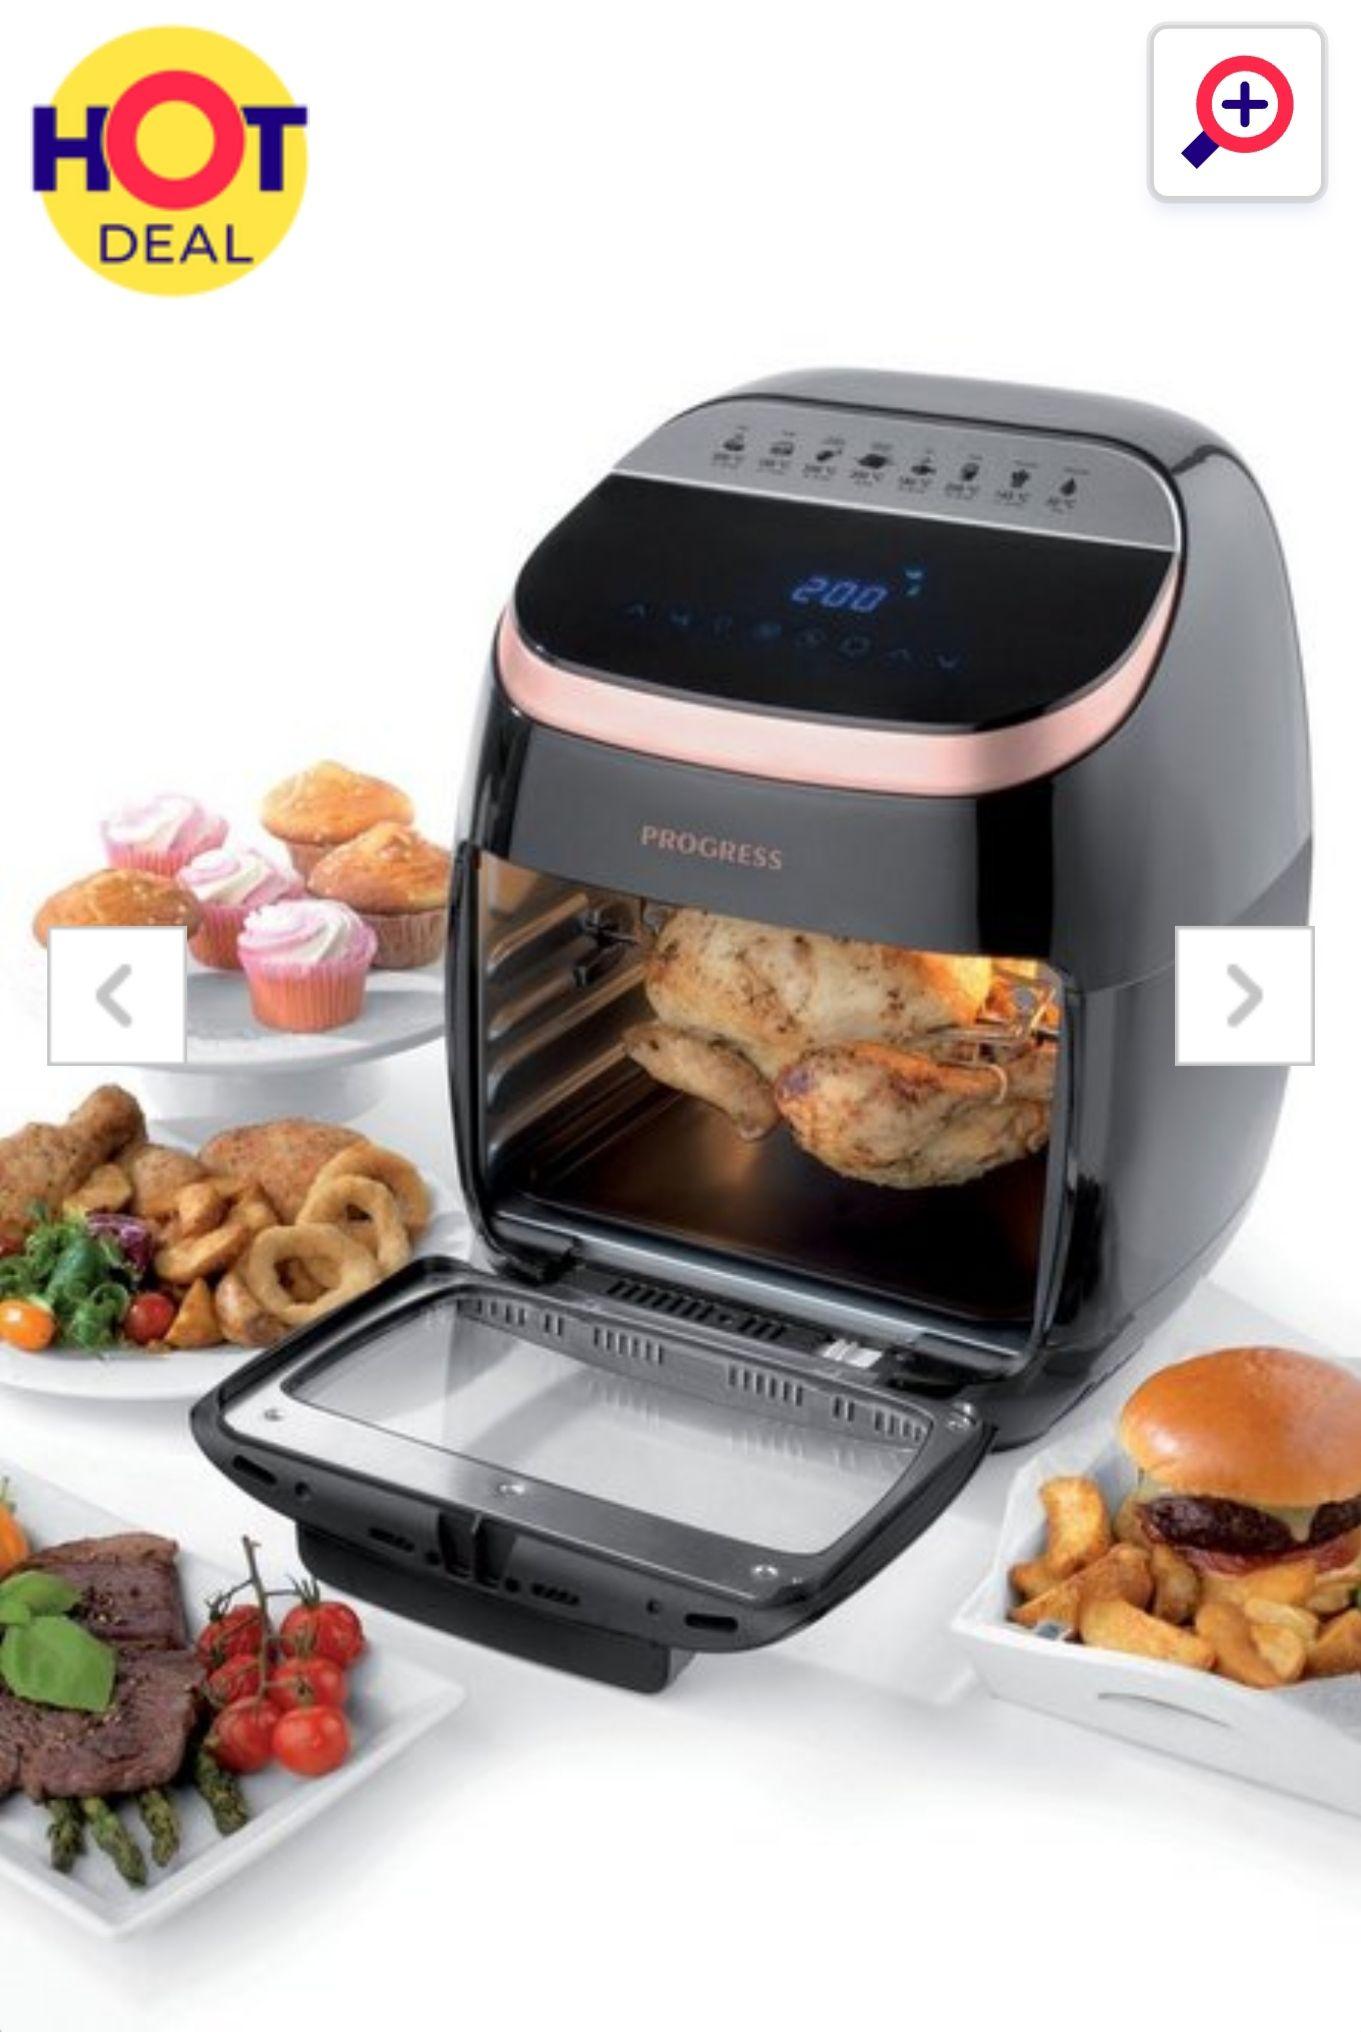 11ltr Progress Digital XL Aircook Air Fryer at Studio for £69.99